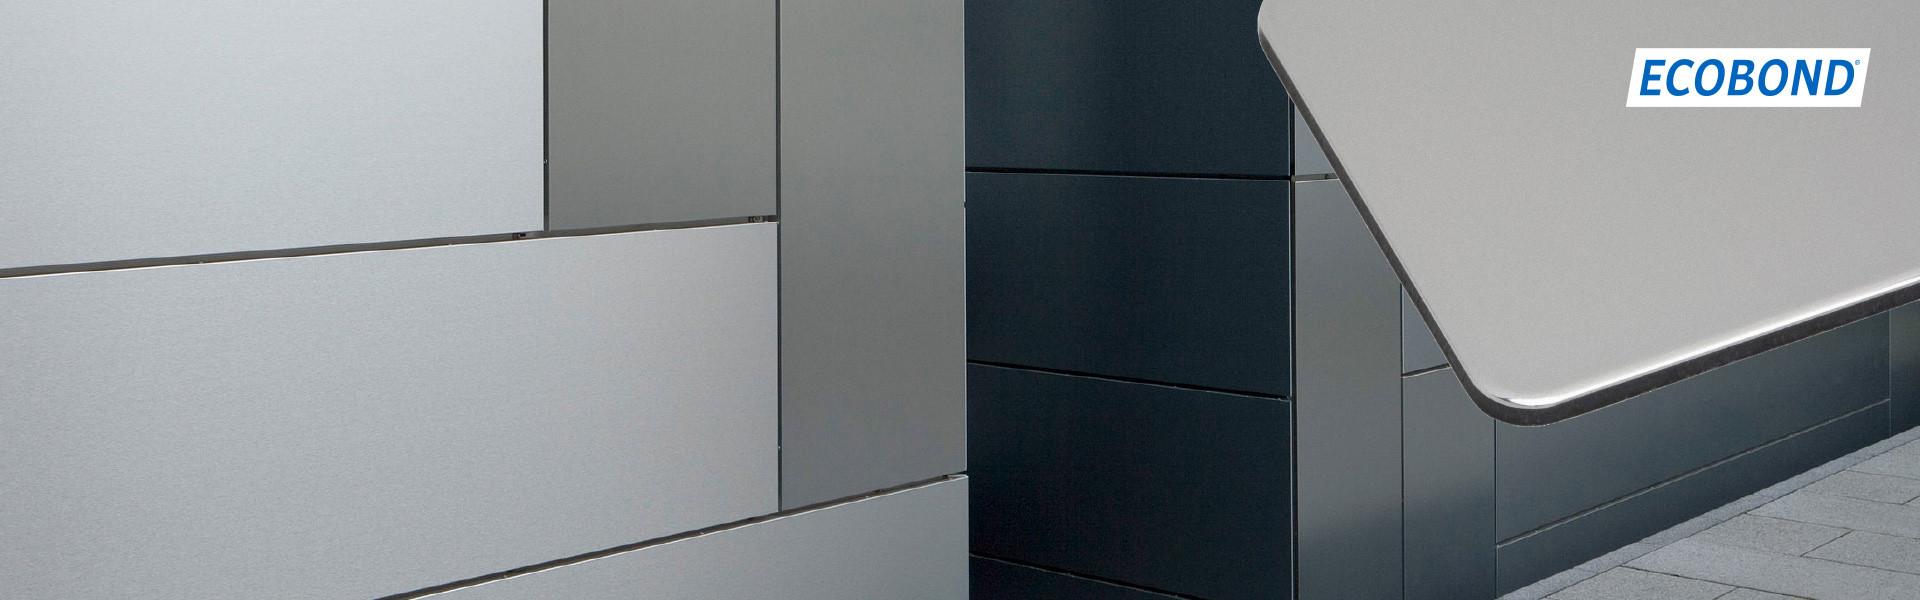 Акция на композитную панель ECOBOND – 12,8 $ за м2